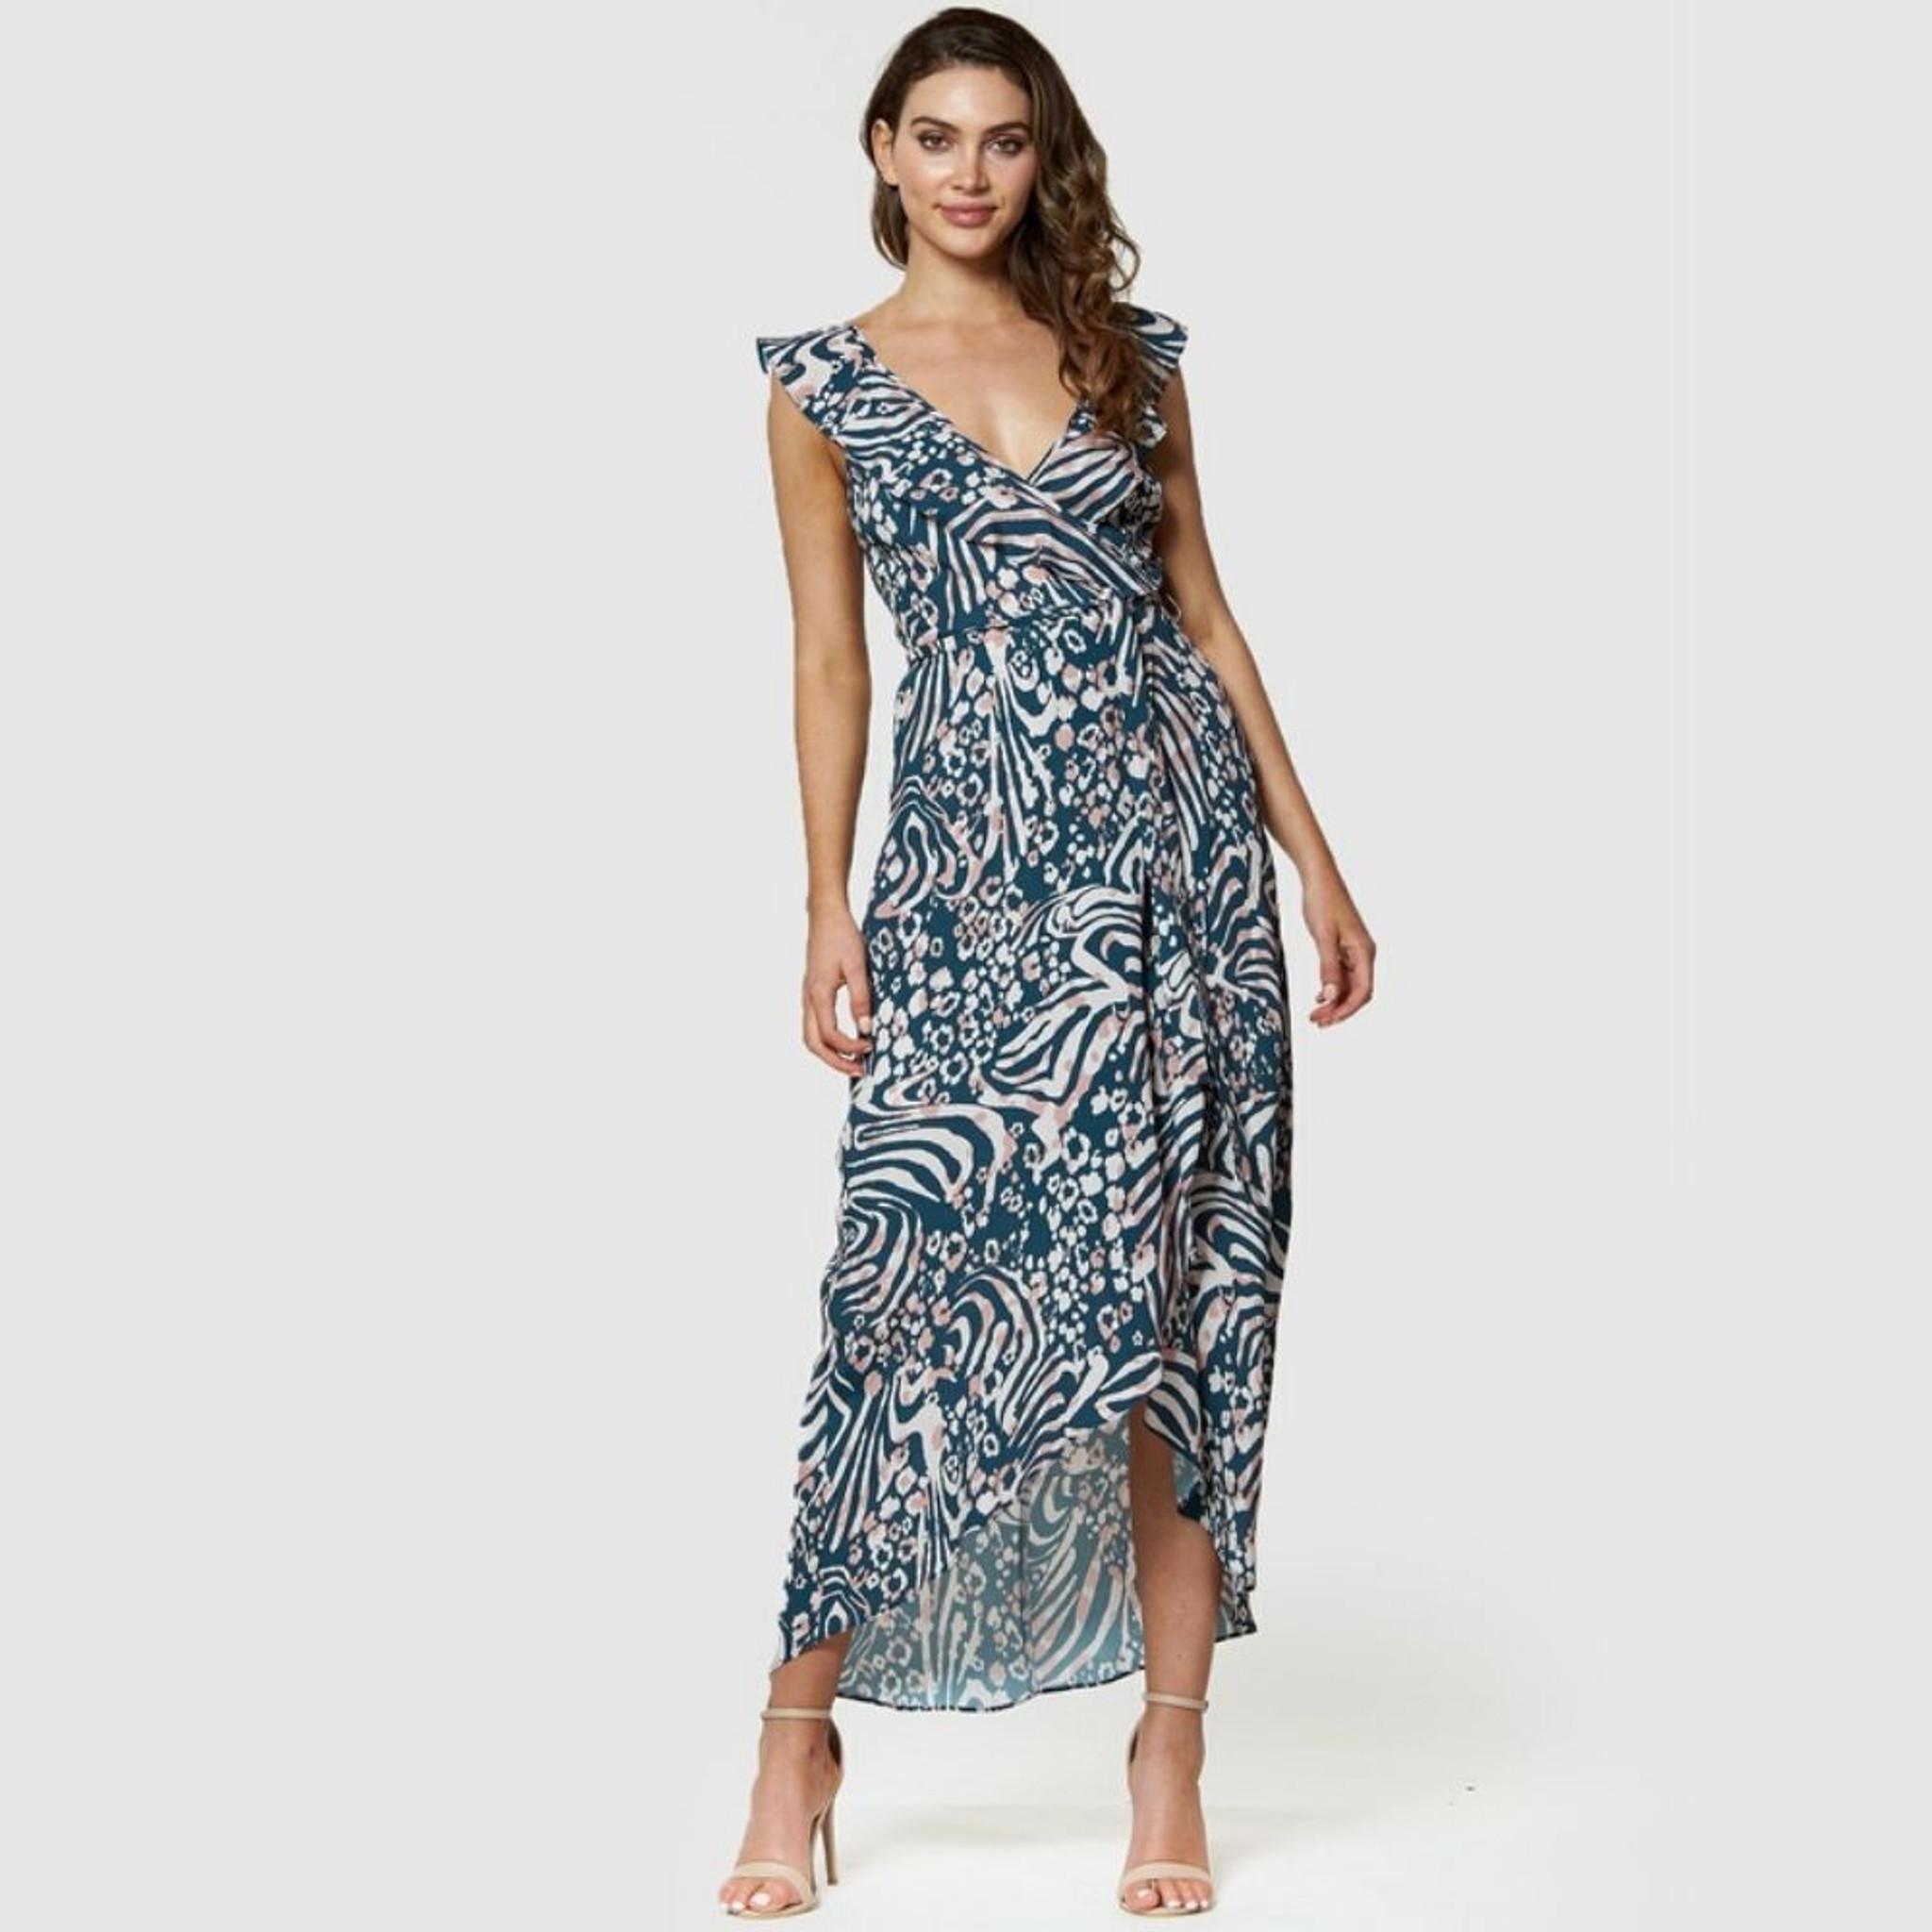 Zheeta Maxi Dress by AMELIUS   Women's Dresses   @alibionline